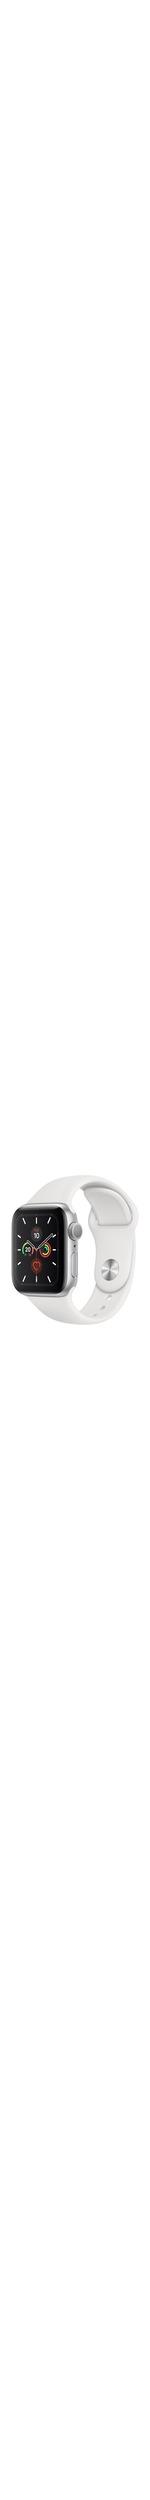 Apple Watch Series 5 Smart Watch - Wrist Wearable - Silver Aluminum Case - White Band - Aluminium Case